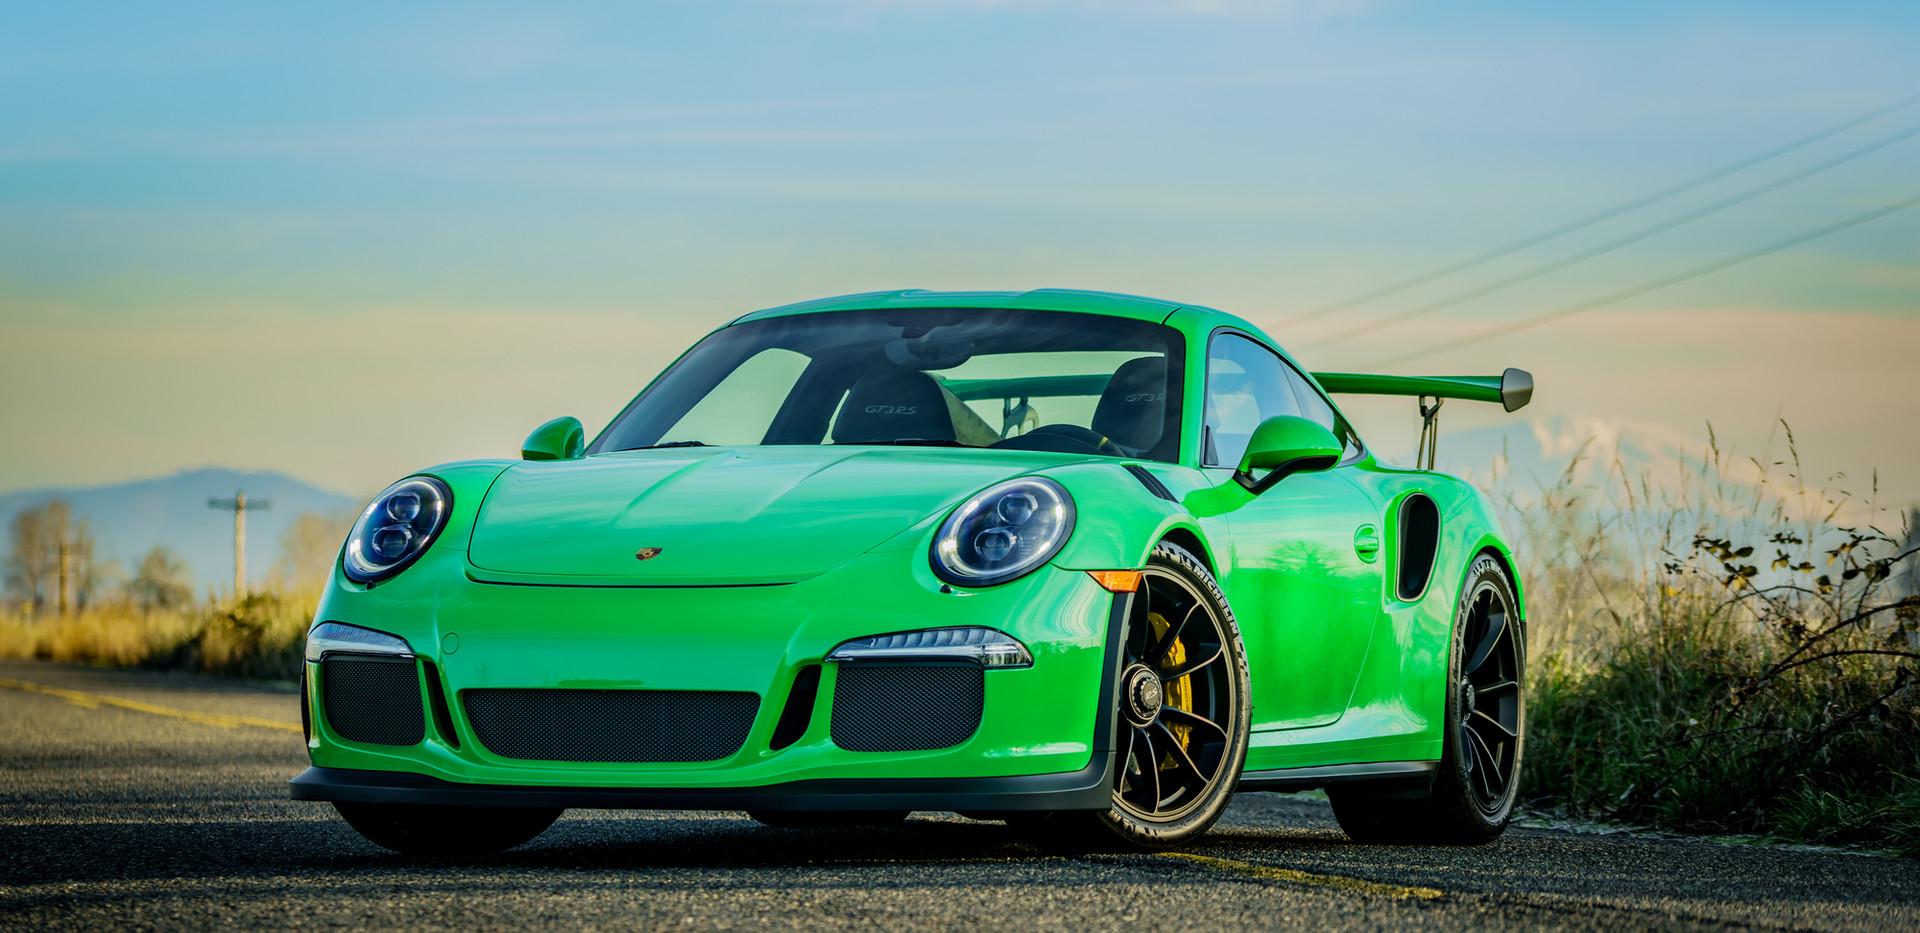 The Image Engine Porsche GT3RS